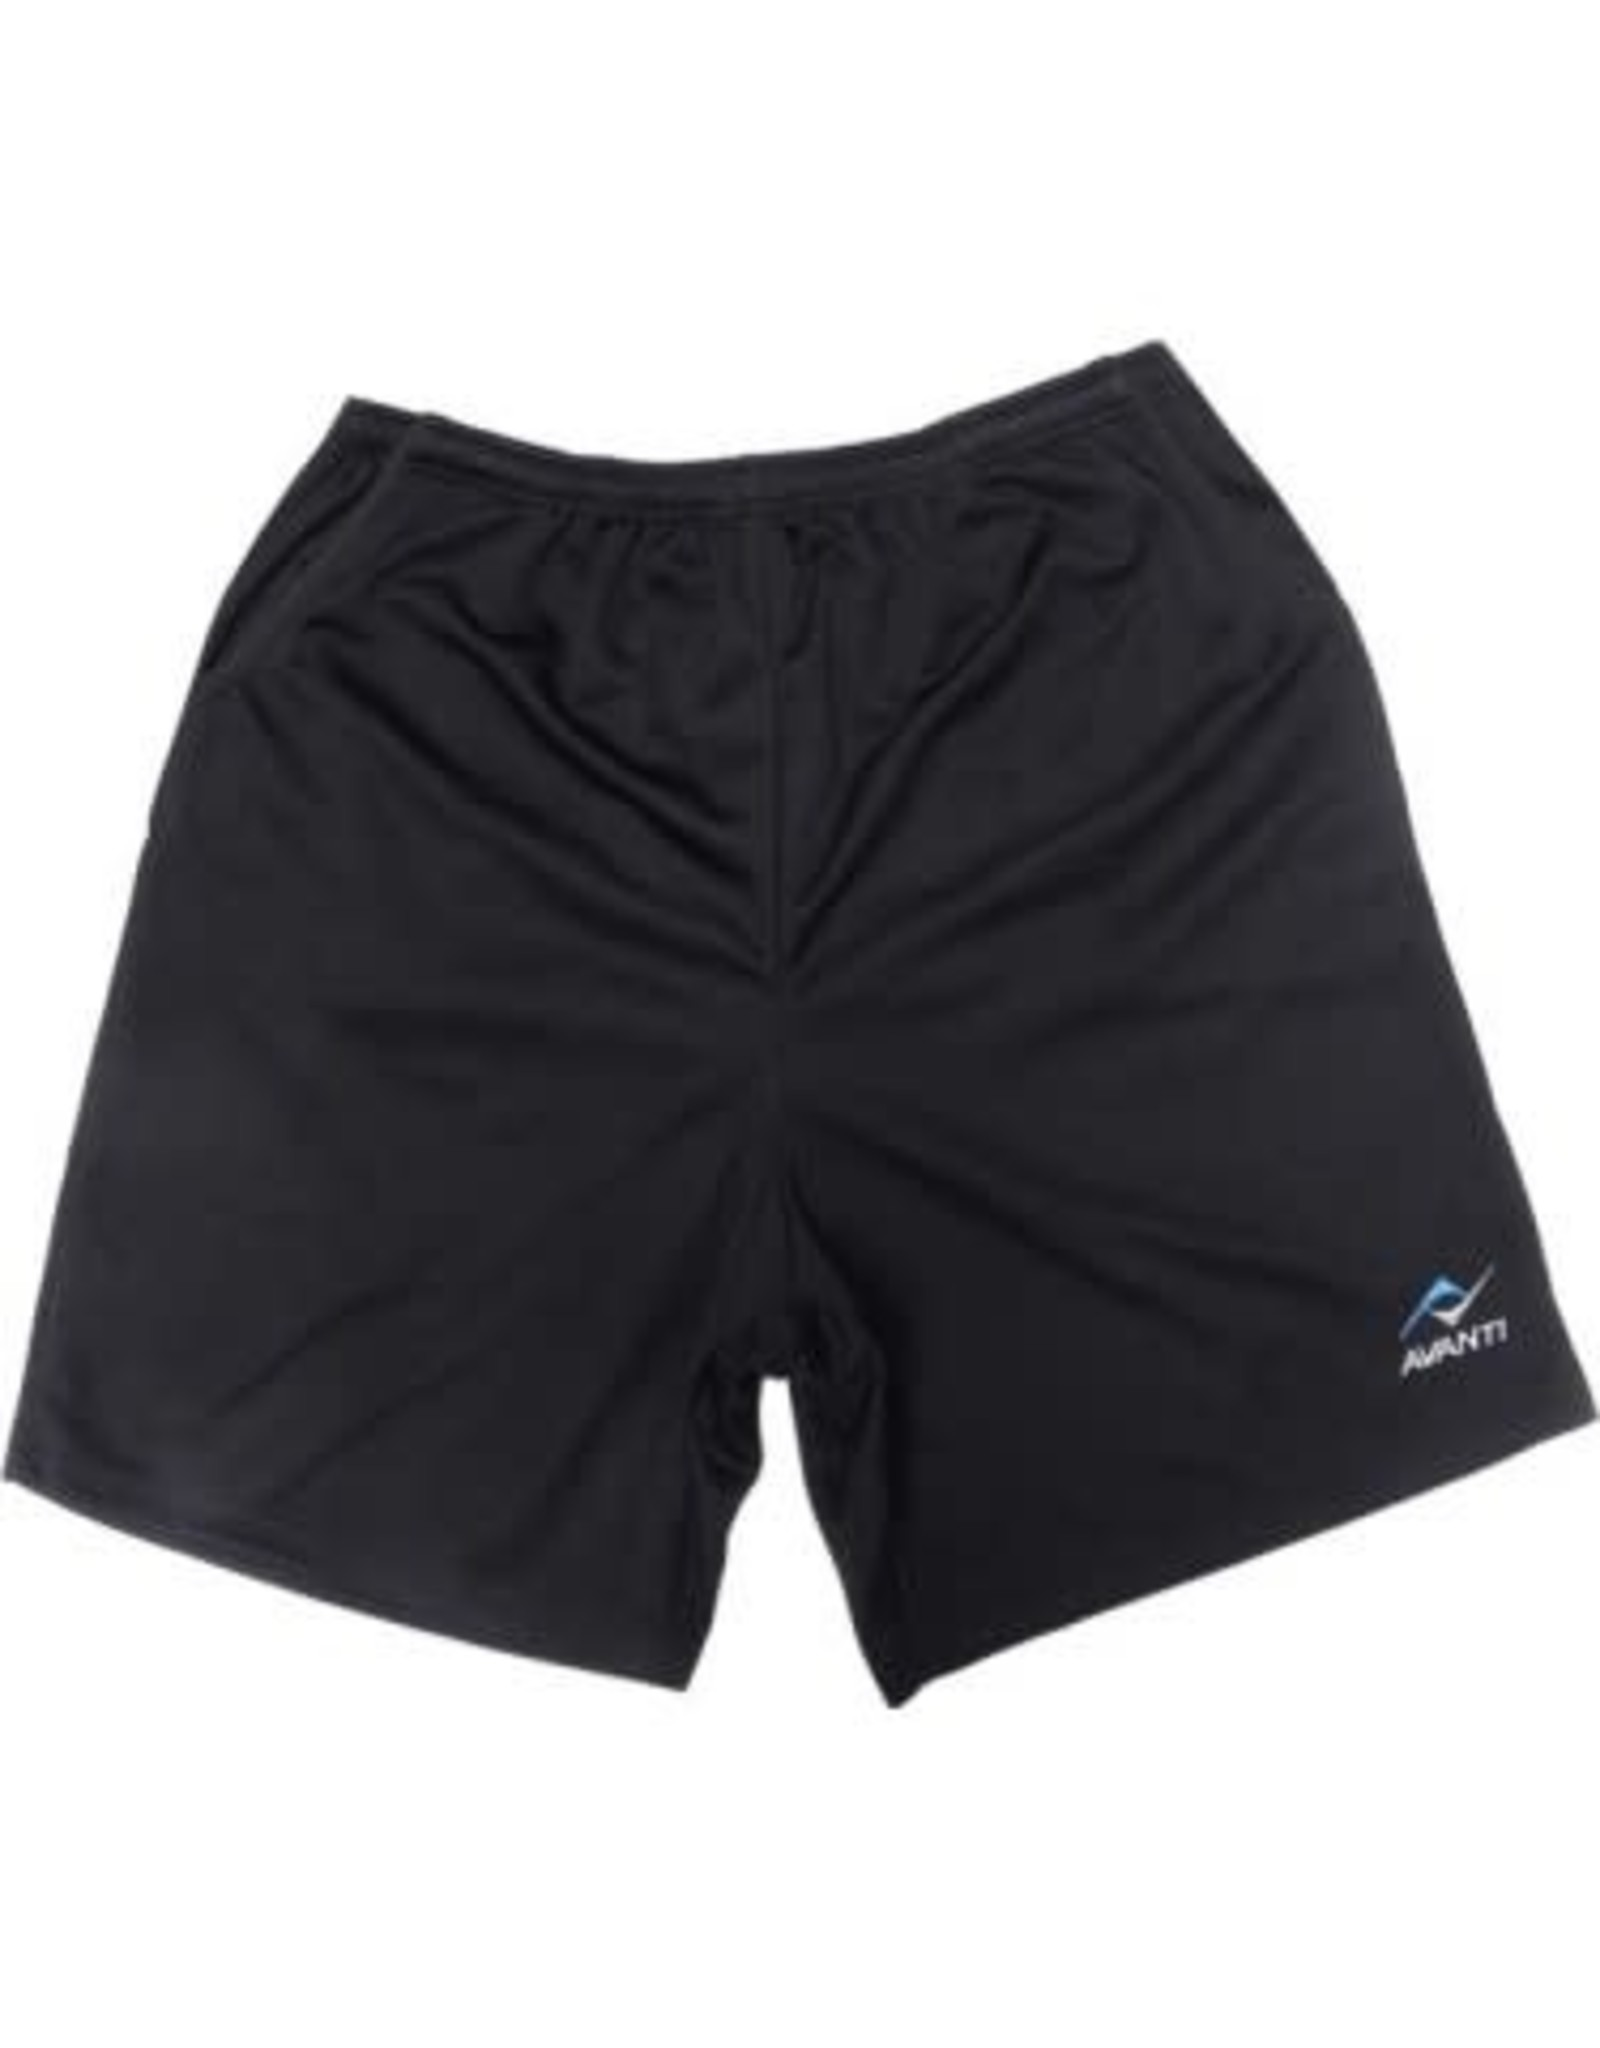 Avanti Avanti Classic Referee Shorts (Black)